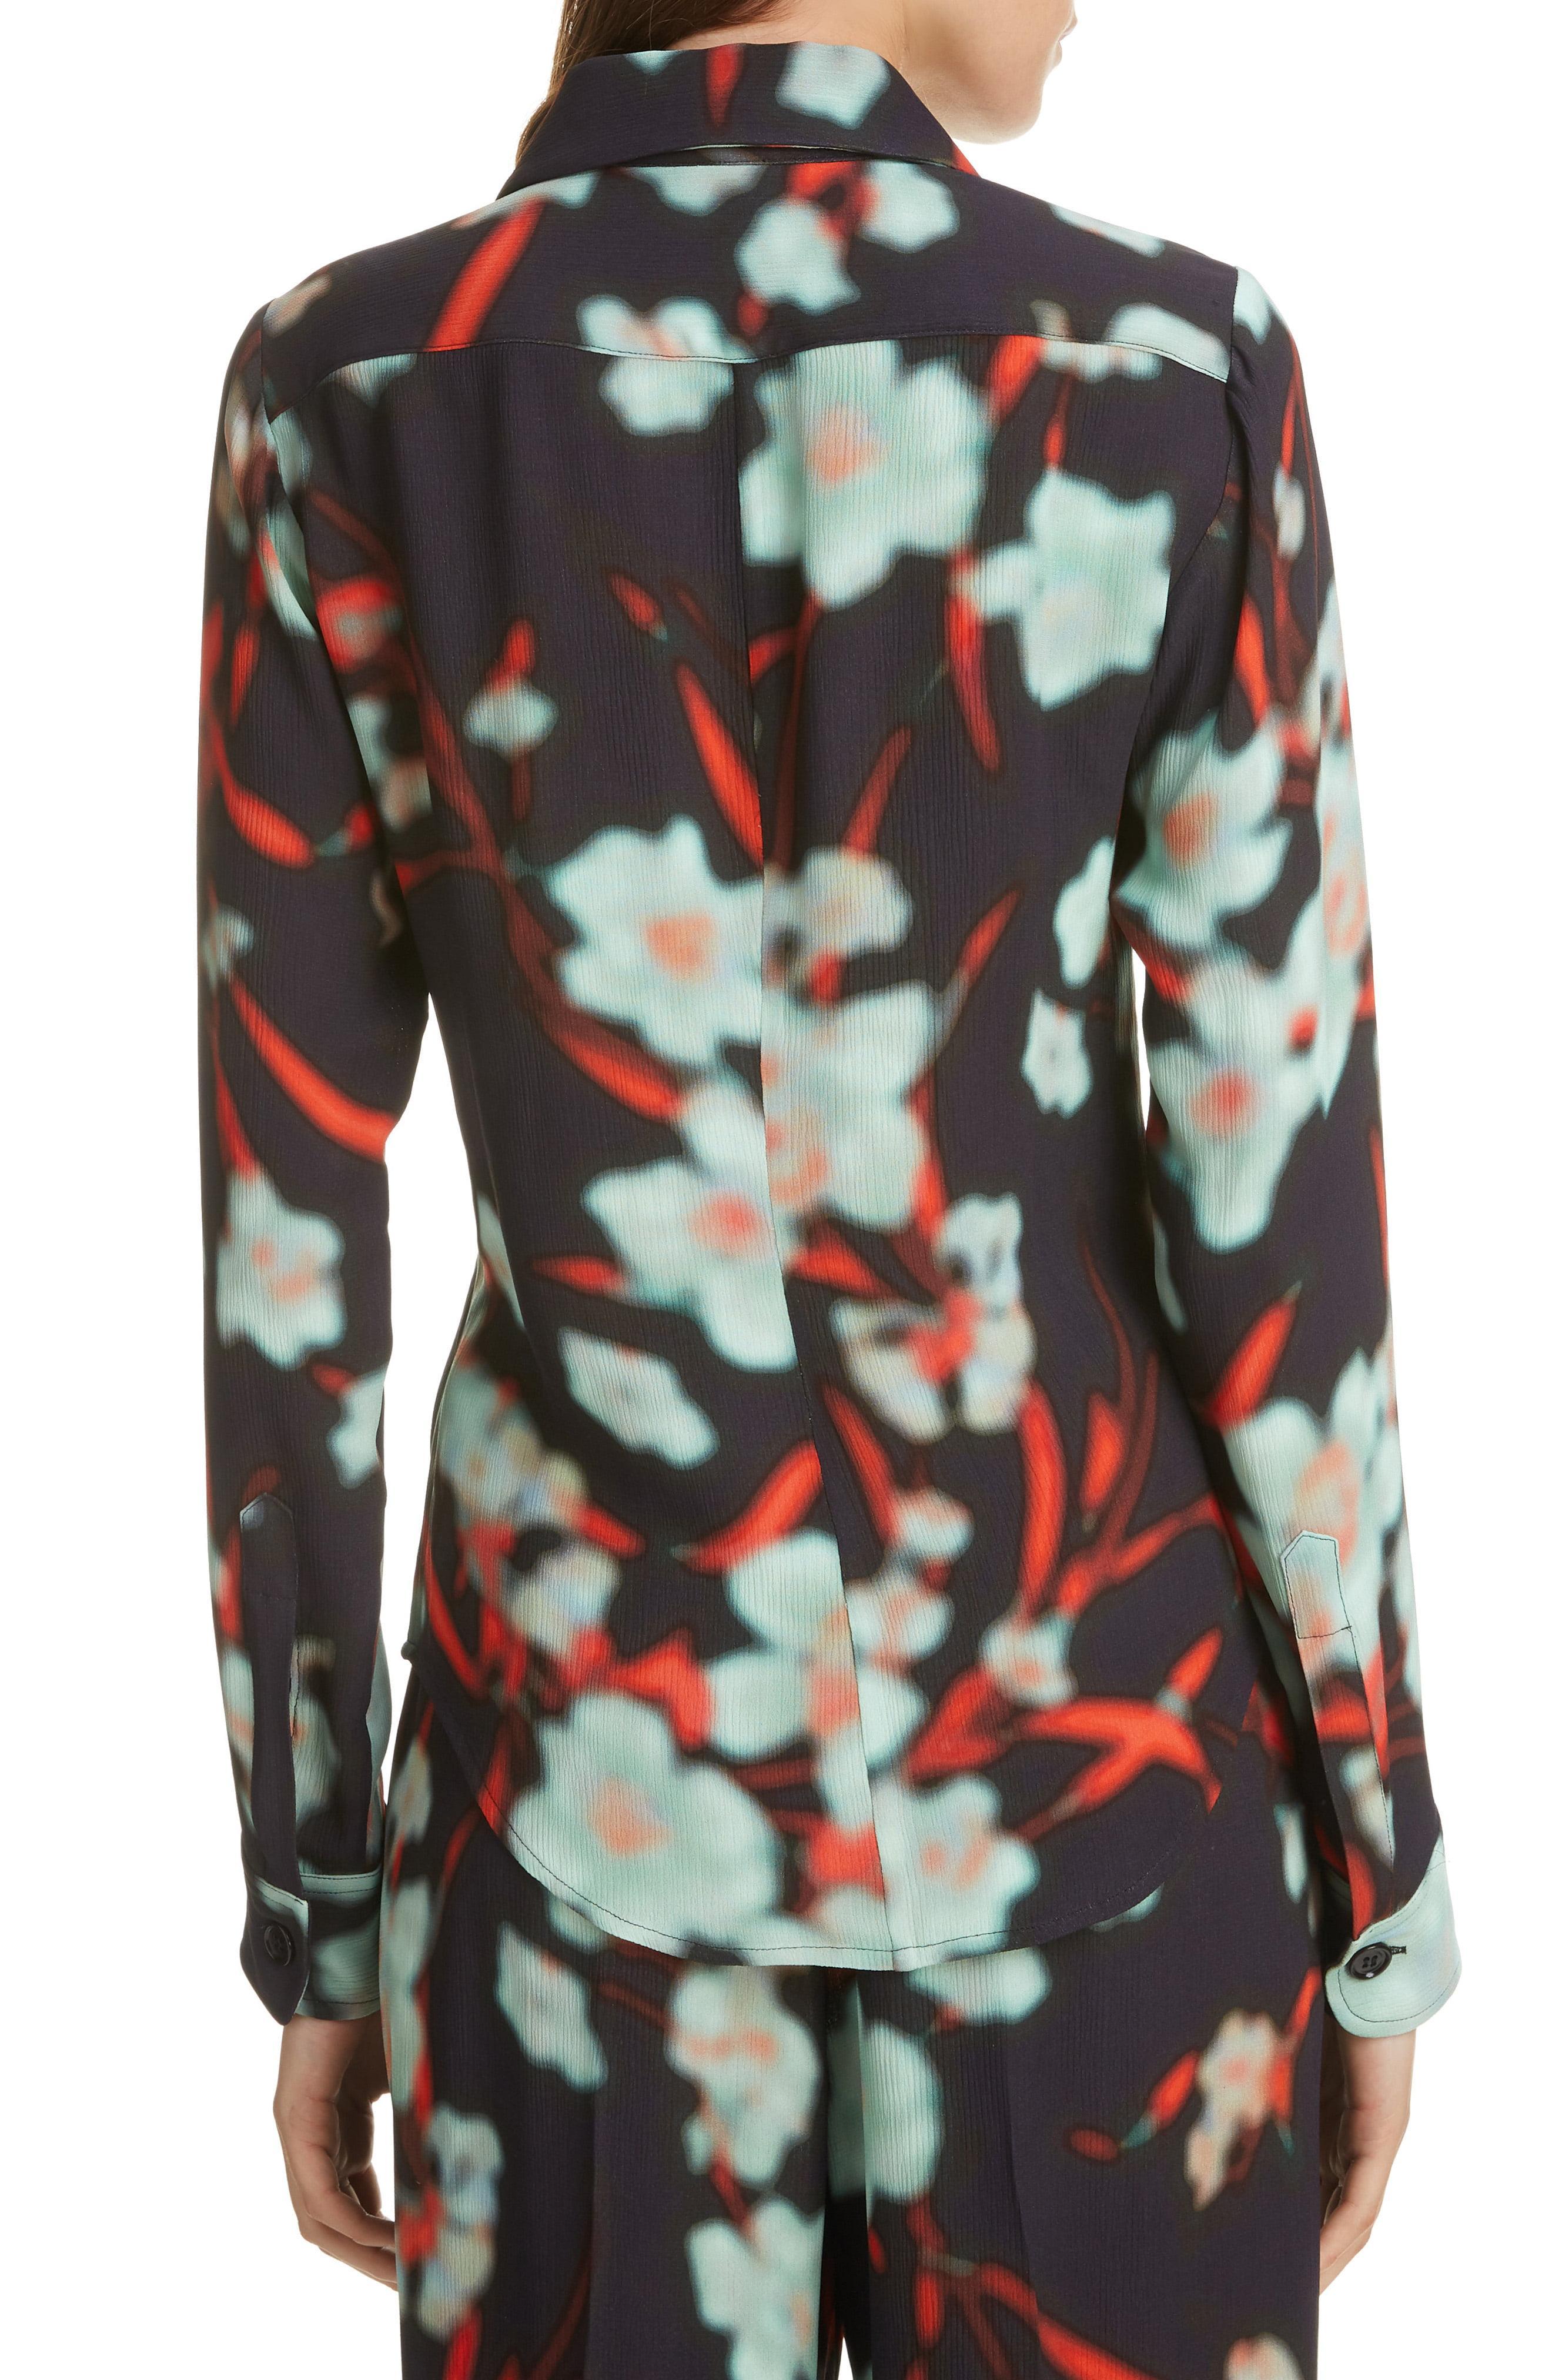 1ddee7a6c7719 Dries Van Noten - Black Dires Van Noten Crinkled Floral Print Shirt - Lyst.  View fullscreen